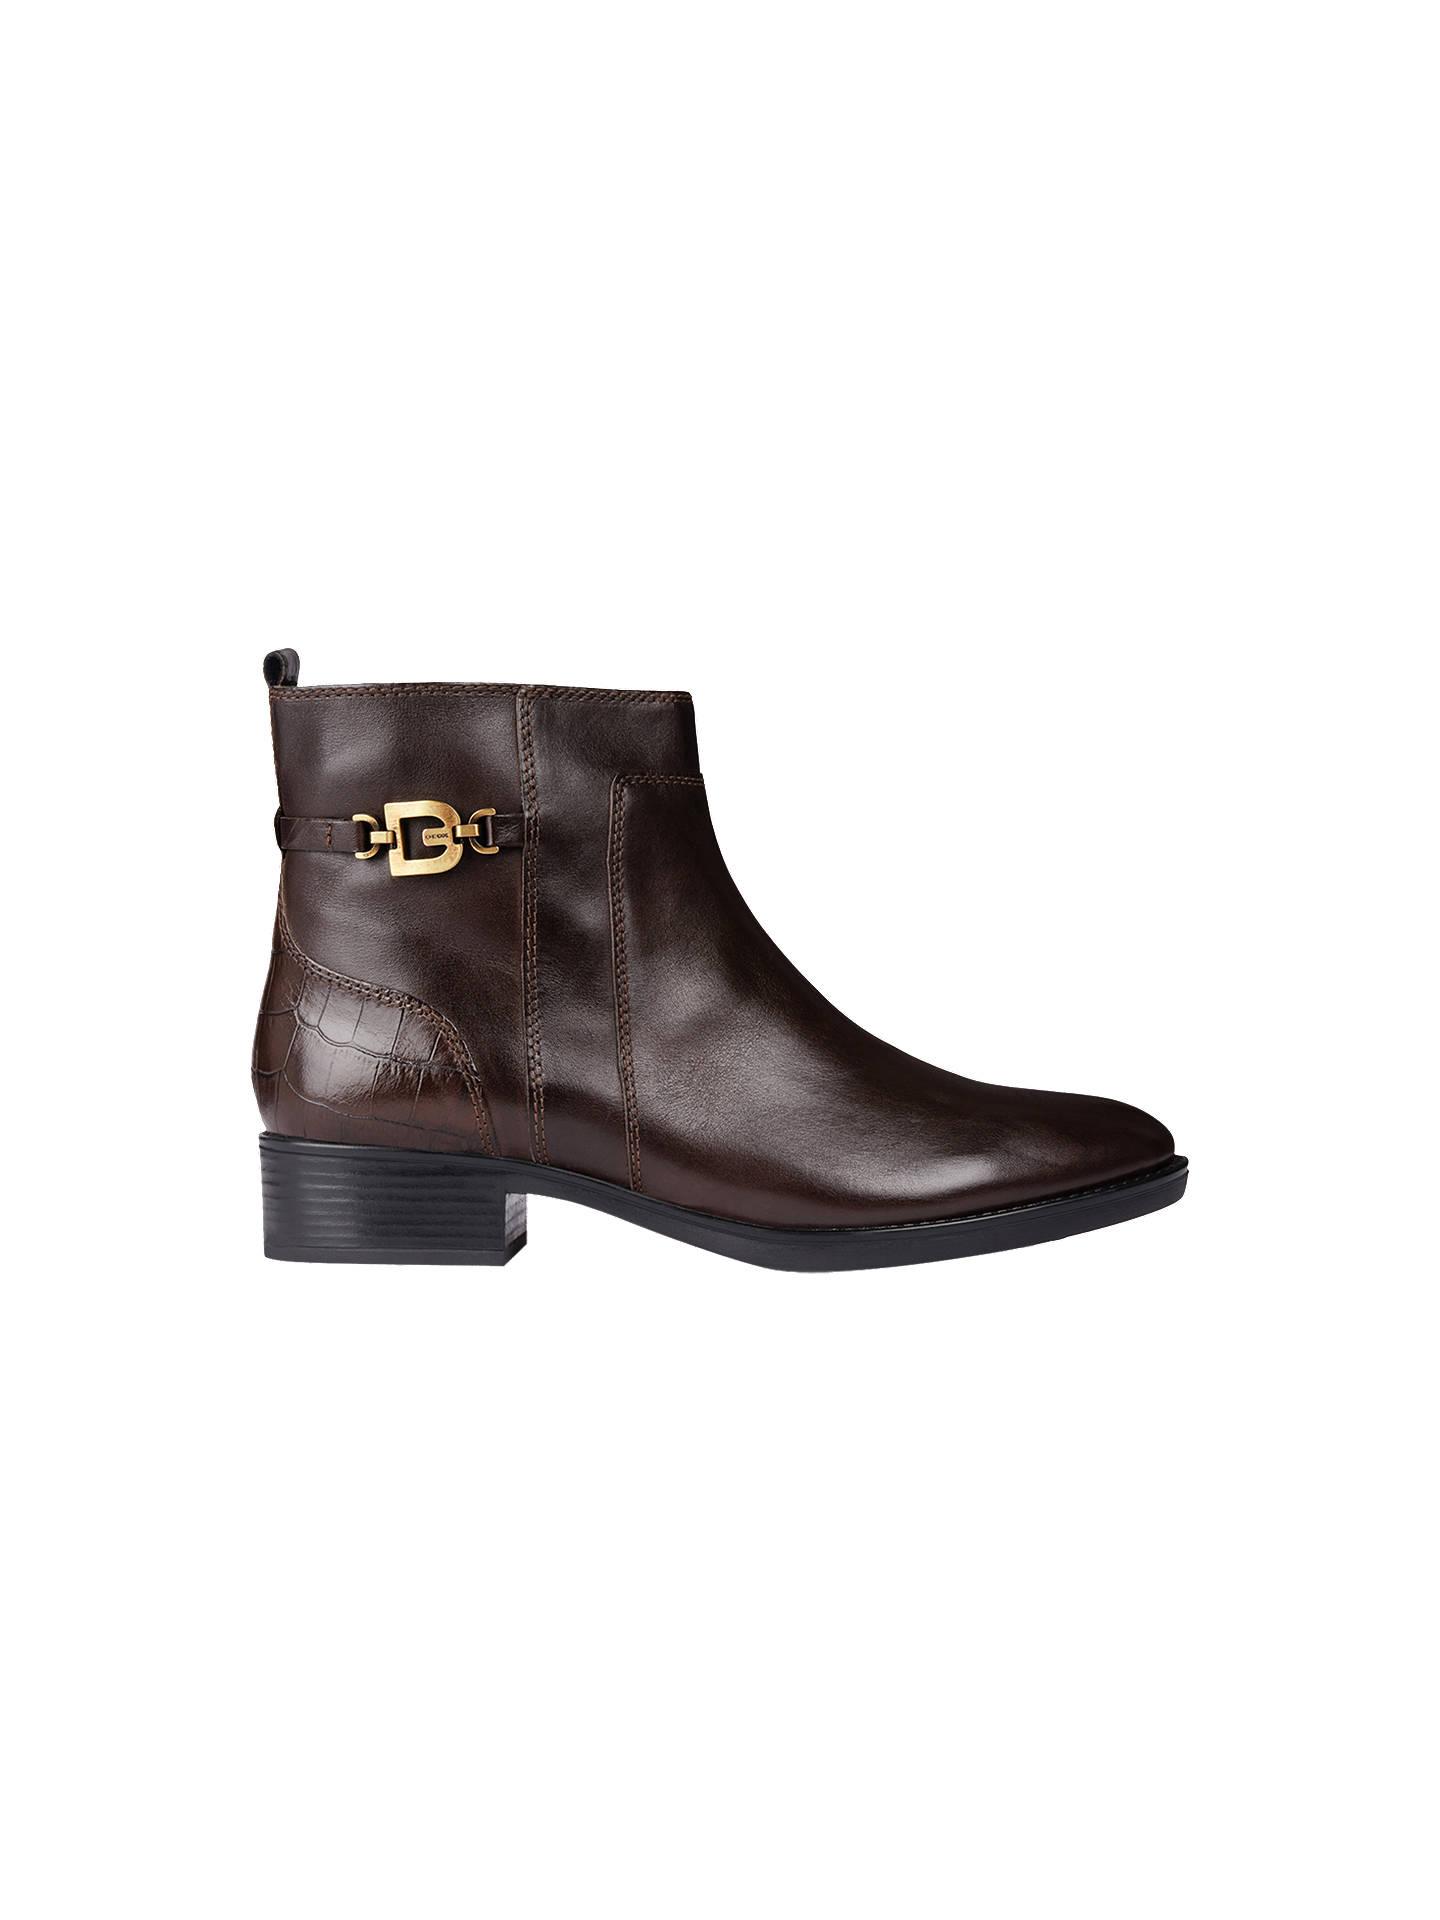 Geox Women Ankle Boots Online Shop, Geox Women Ankle Boots